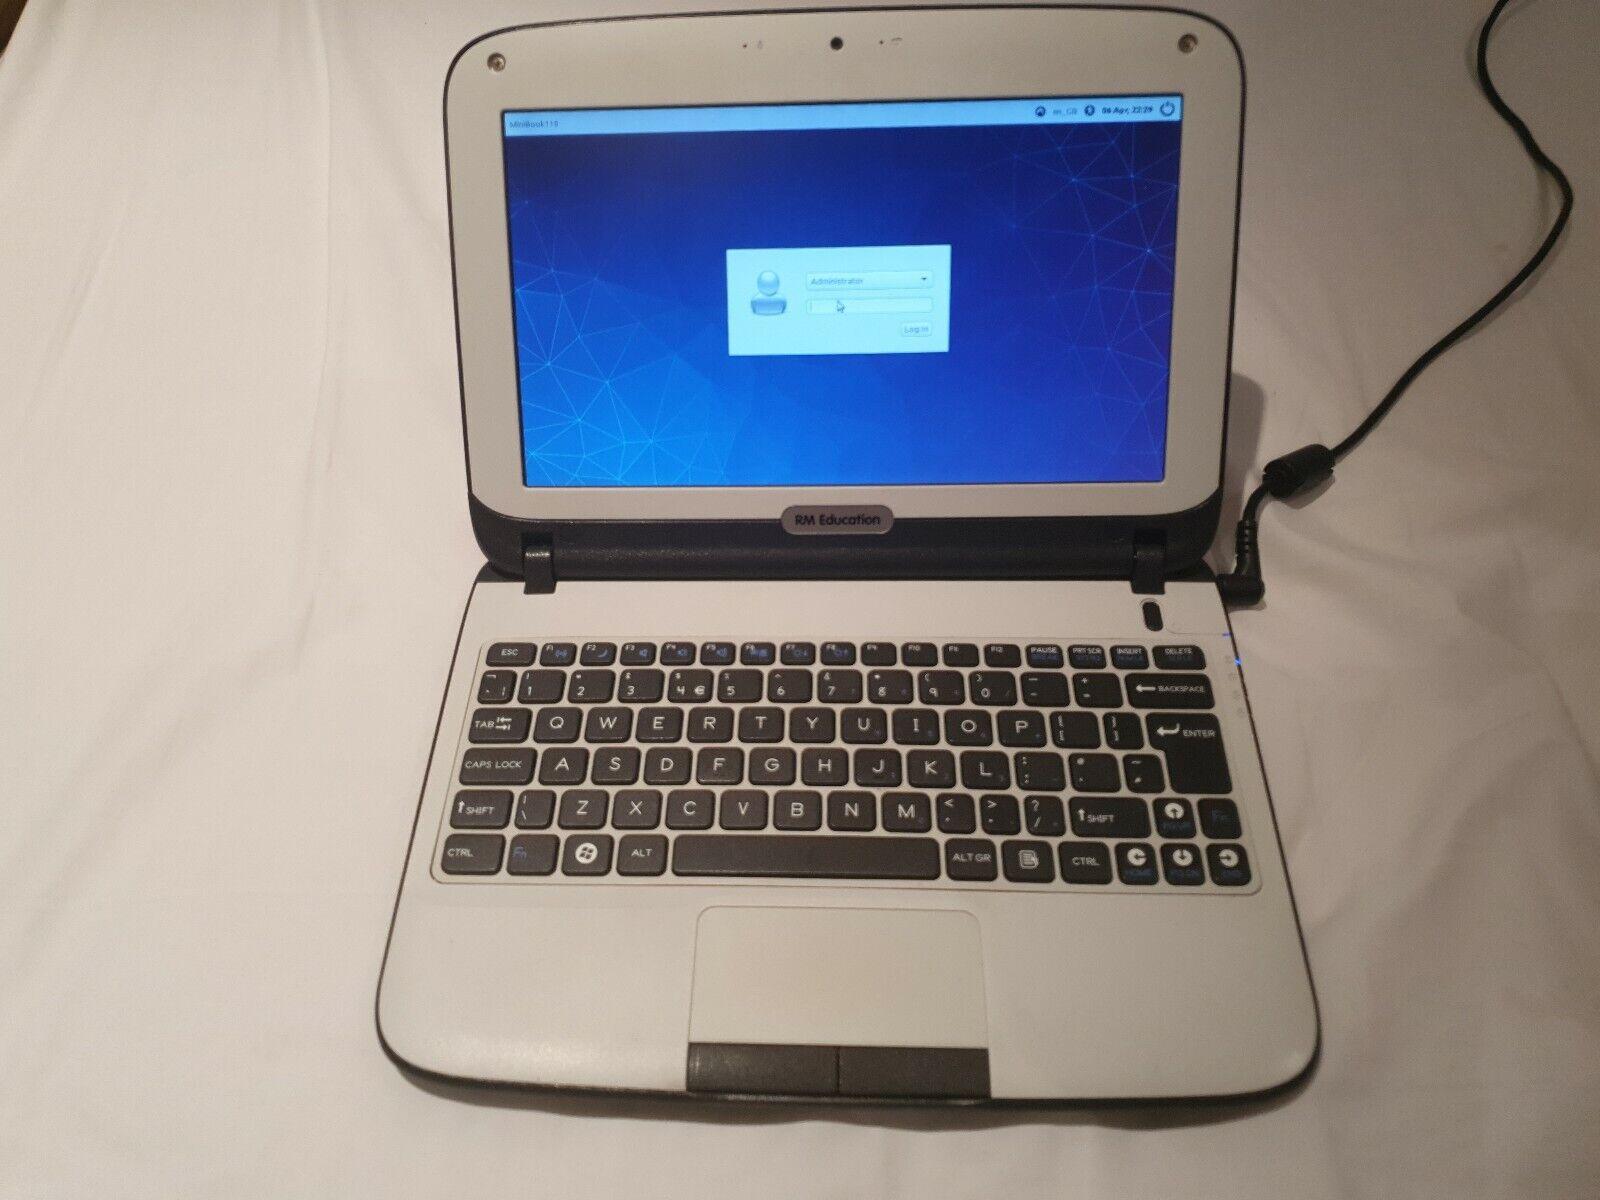 Laptop Windows - Cheap Kids' Mini Laptop/Netbook RM MiniBook 120 Windows 7 - Great for schoolwork